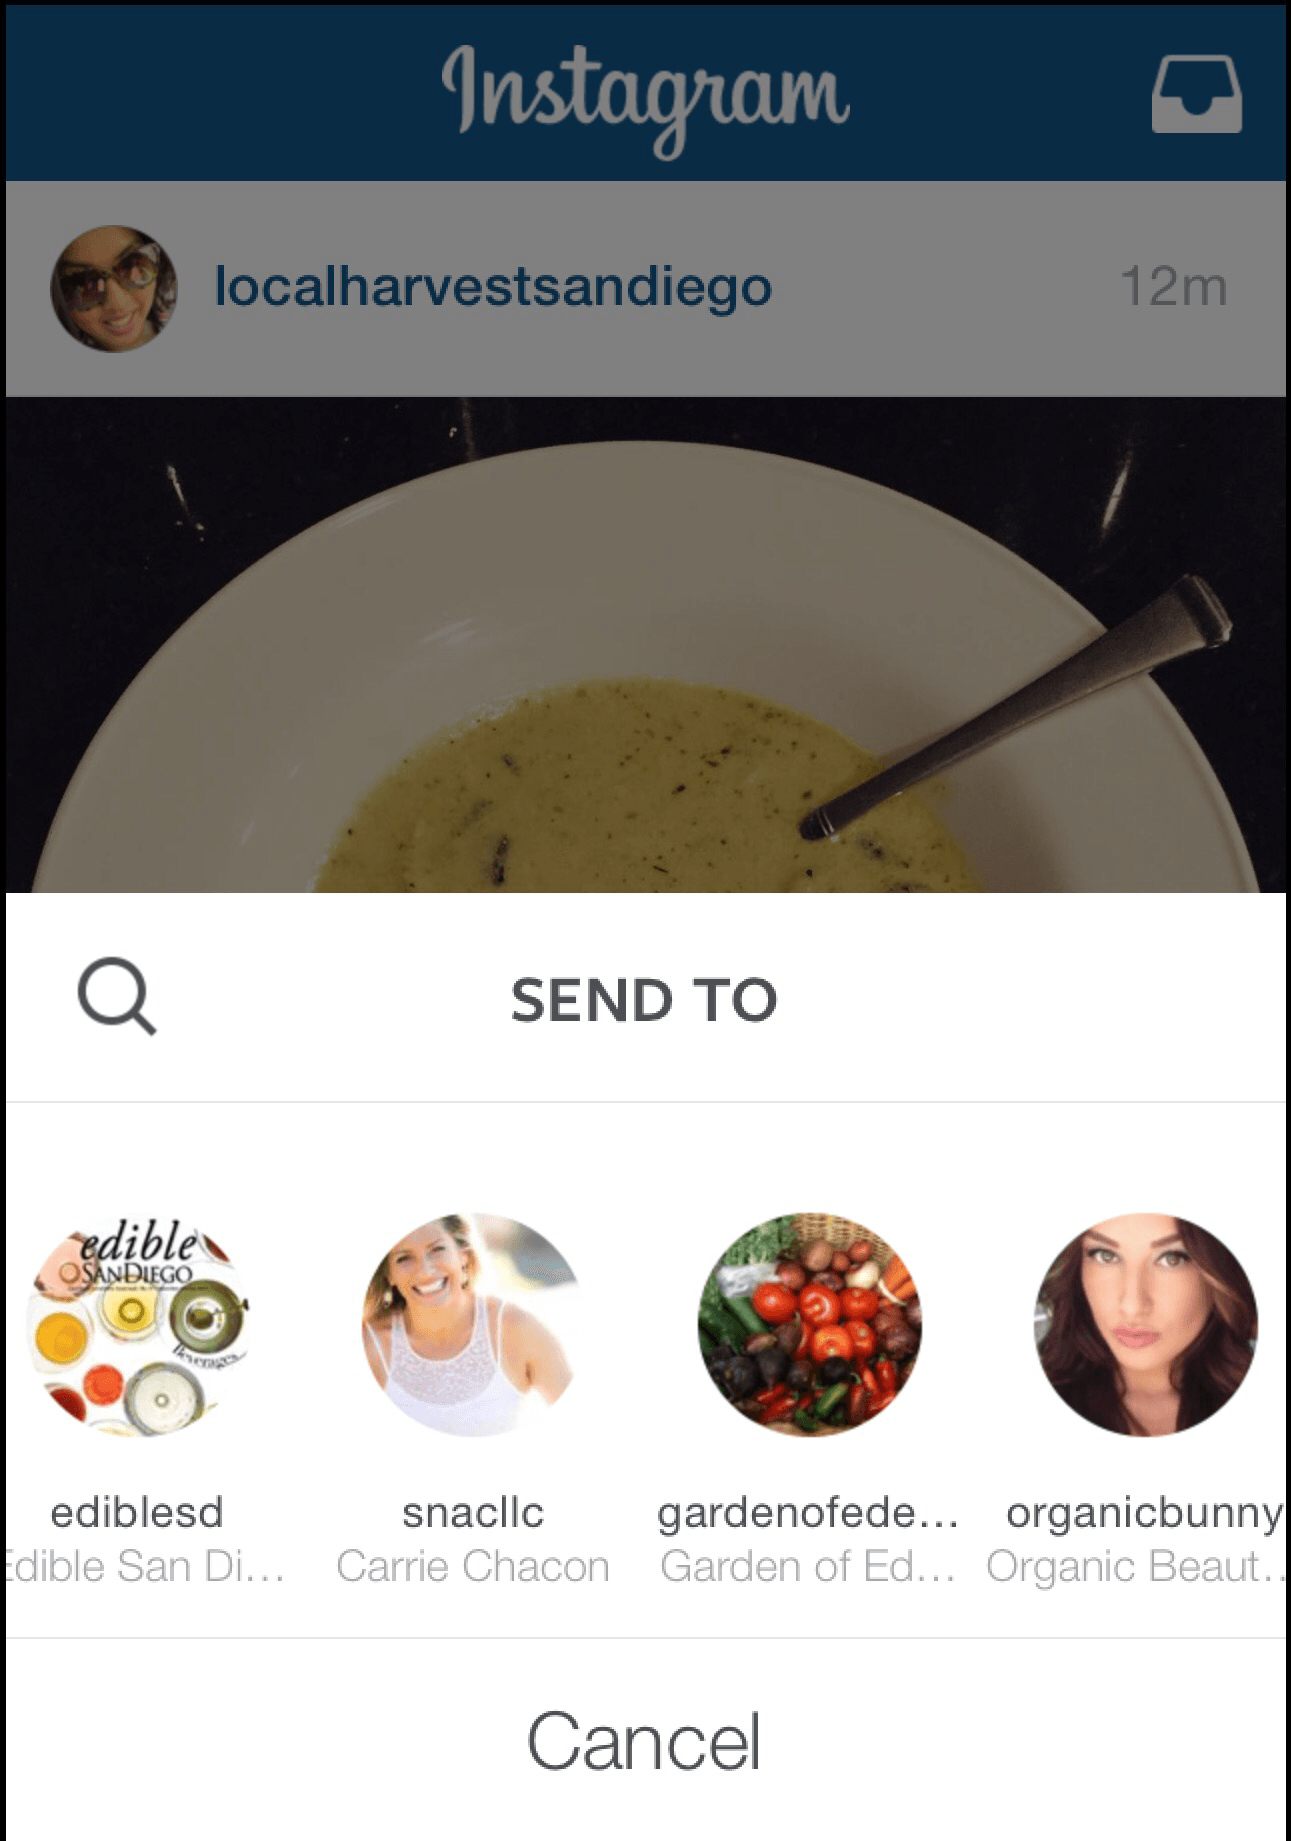 Instagram Changes for September 2015